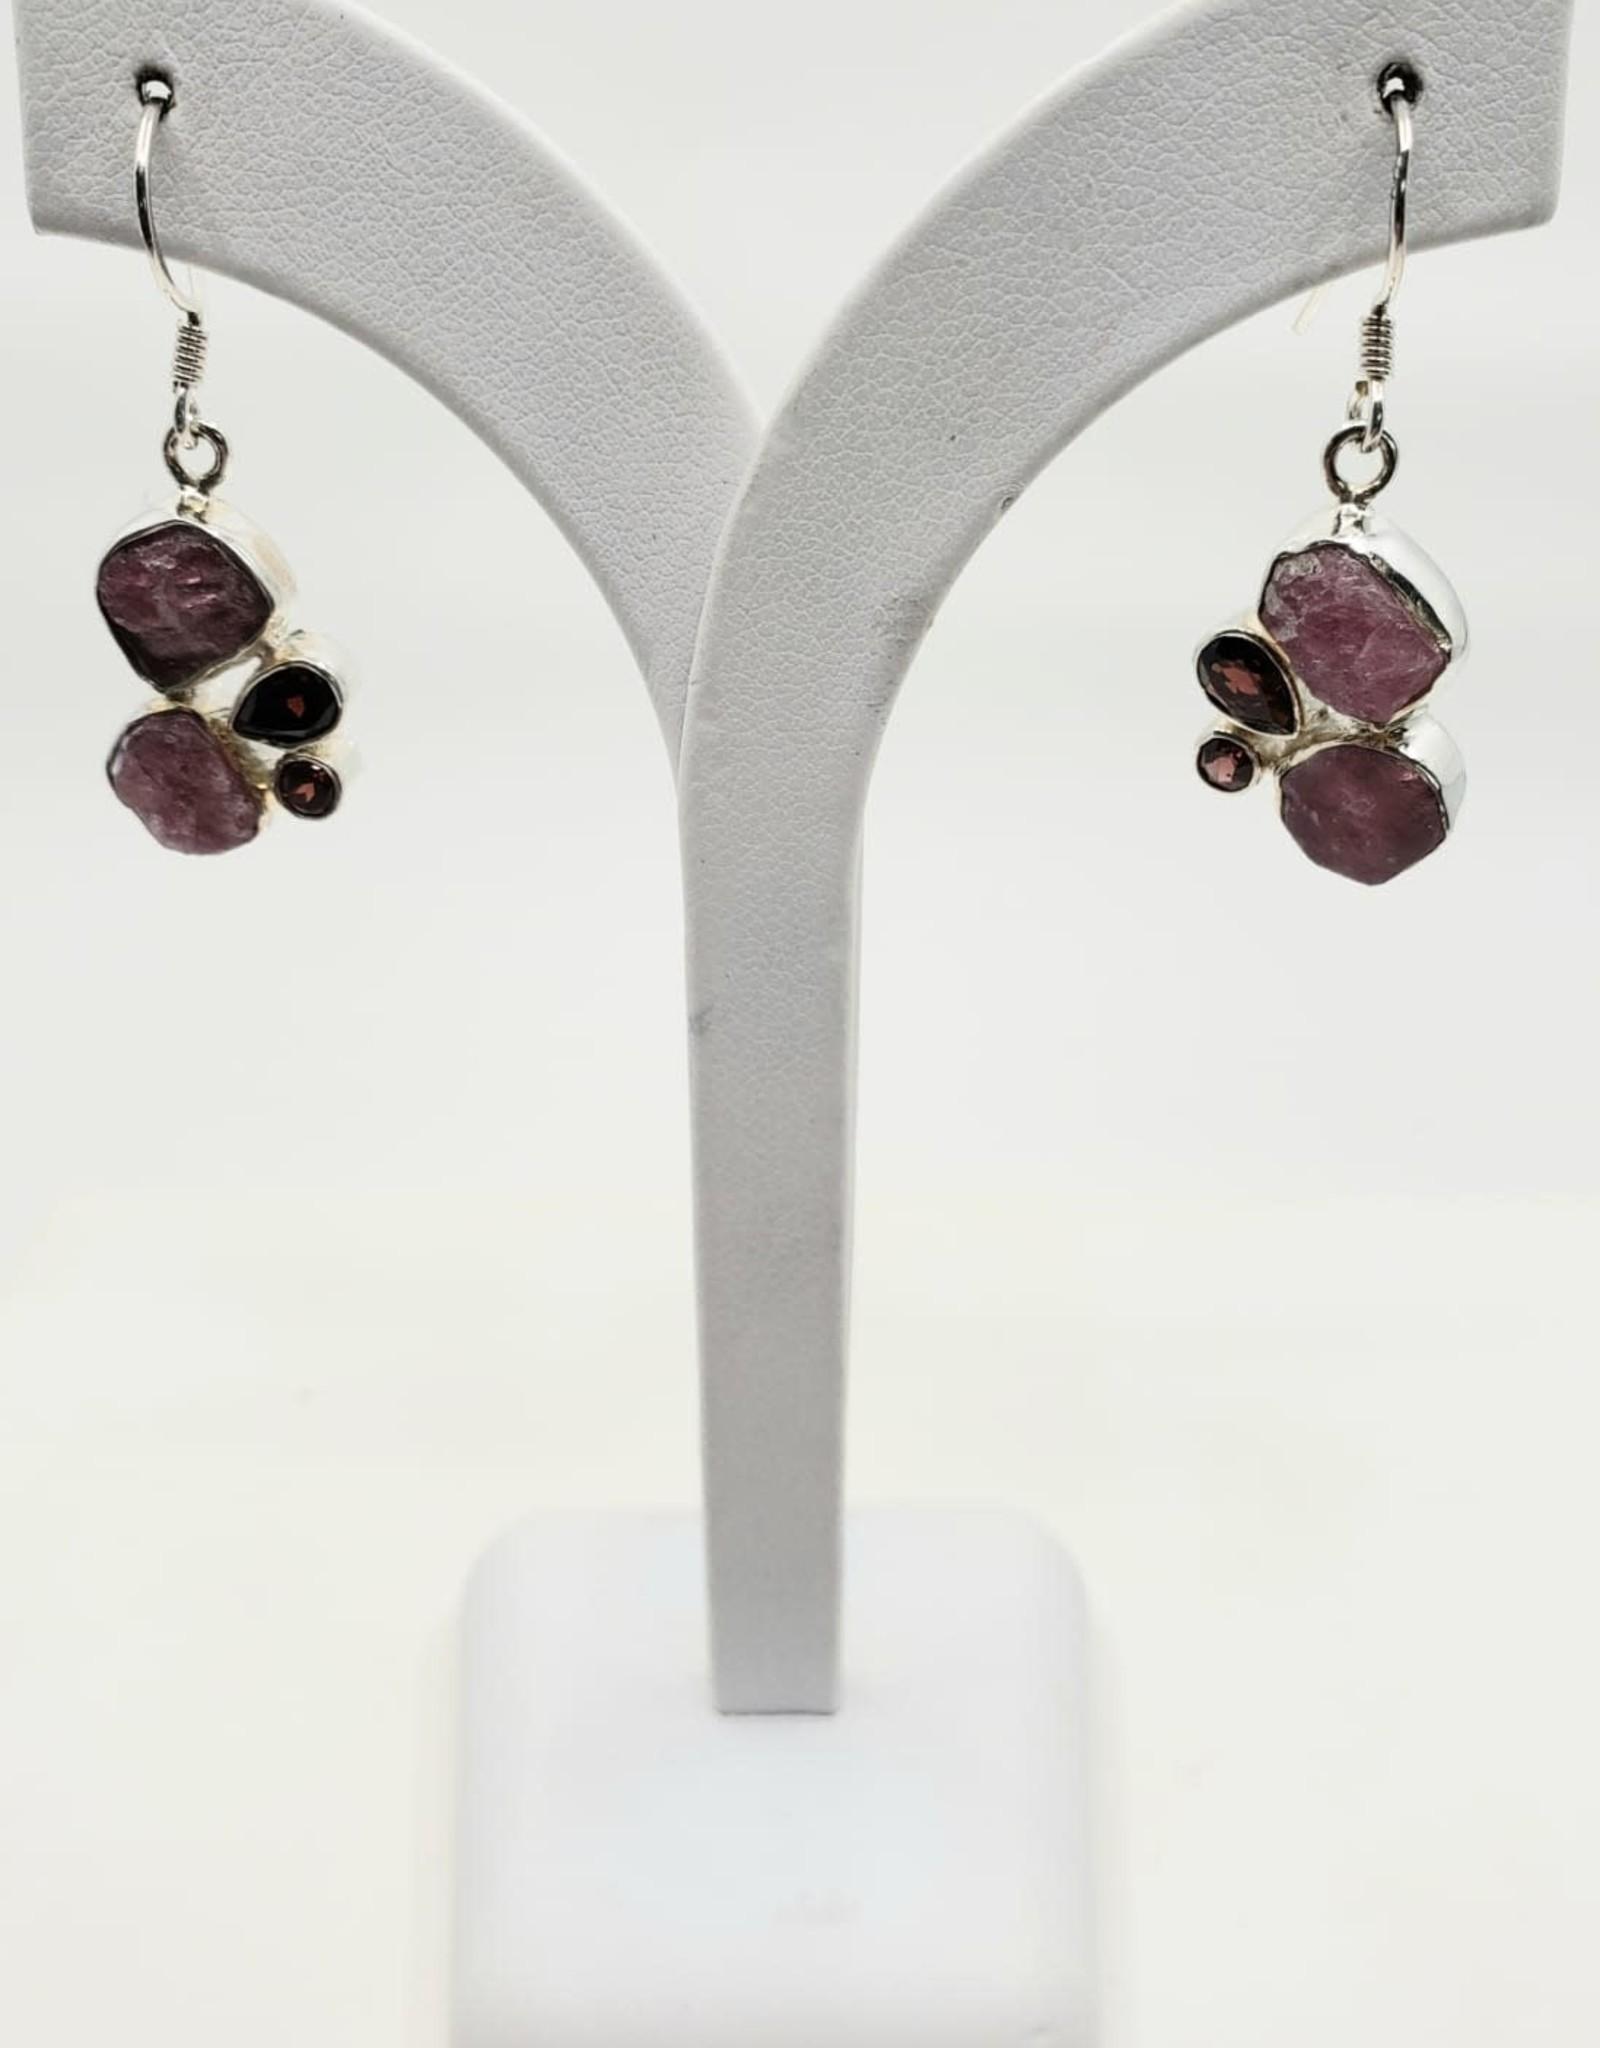 tourmaline and garnet earrings